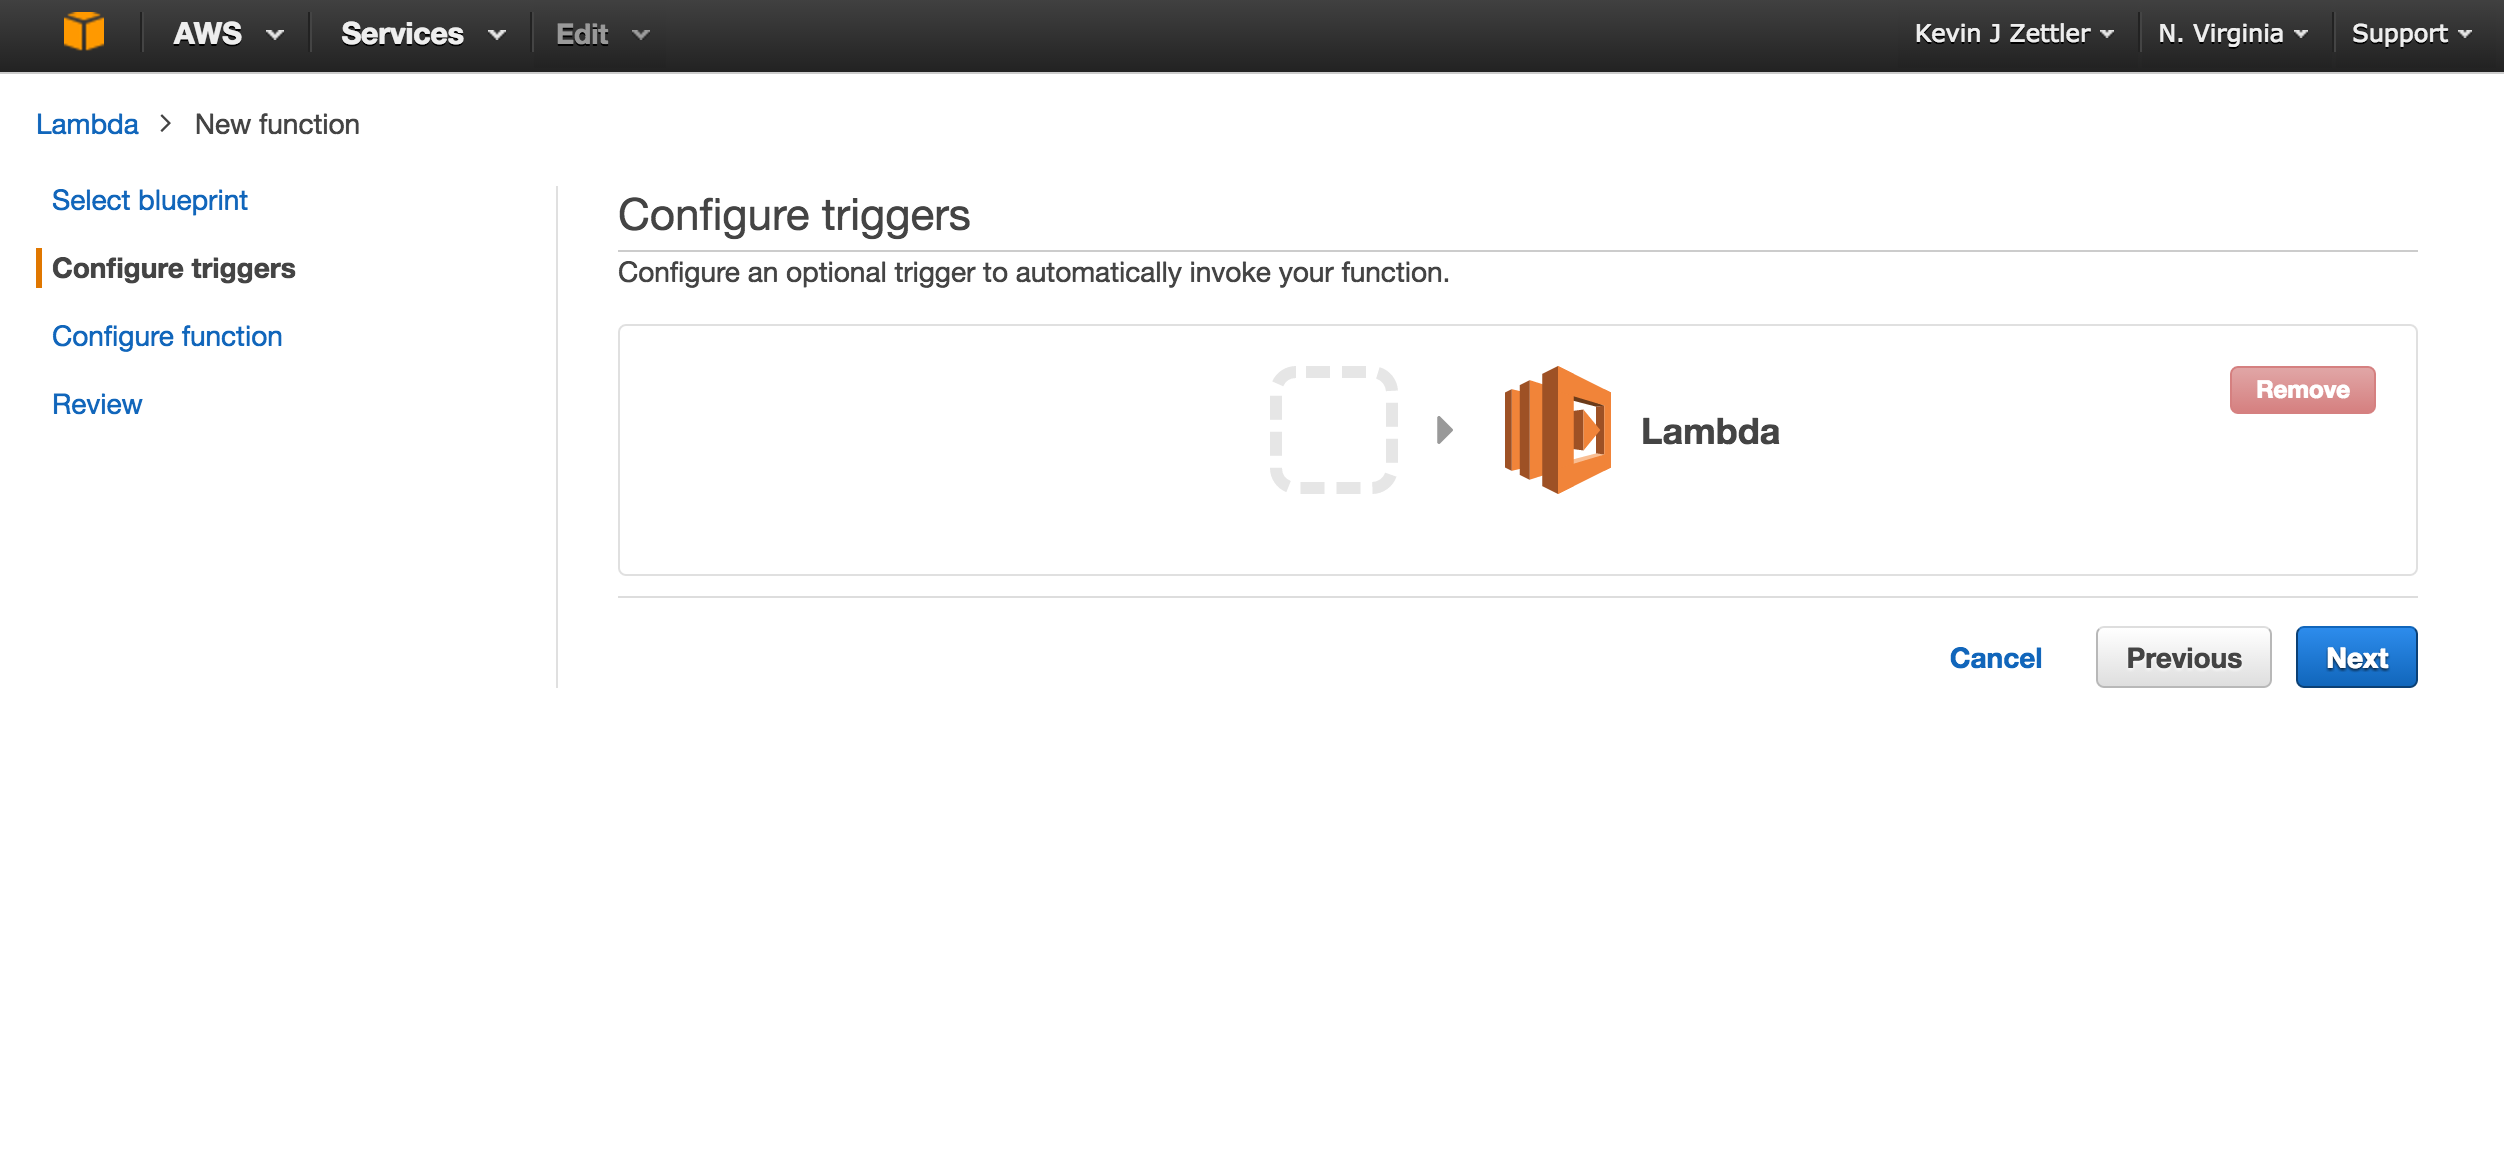 Screenshot of the Configure triggers screen